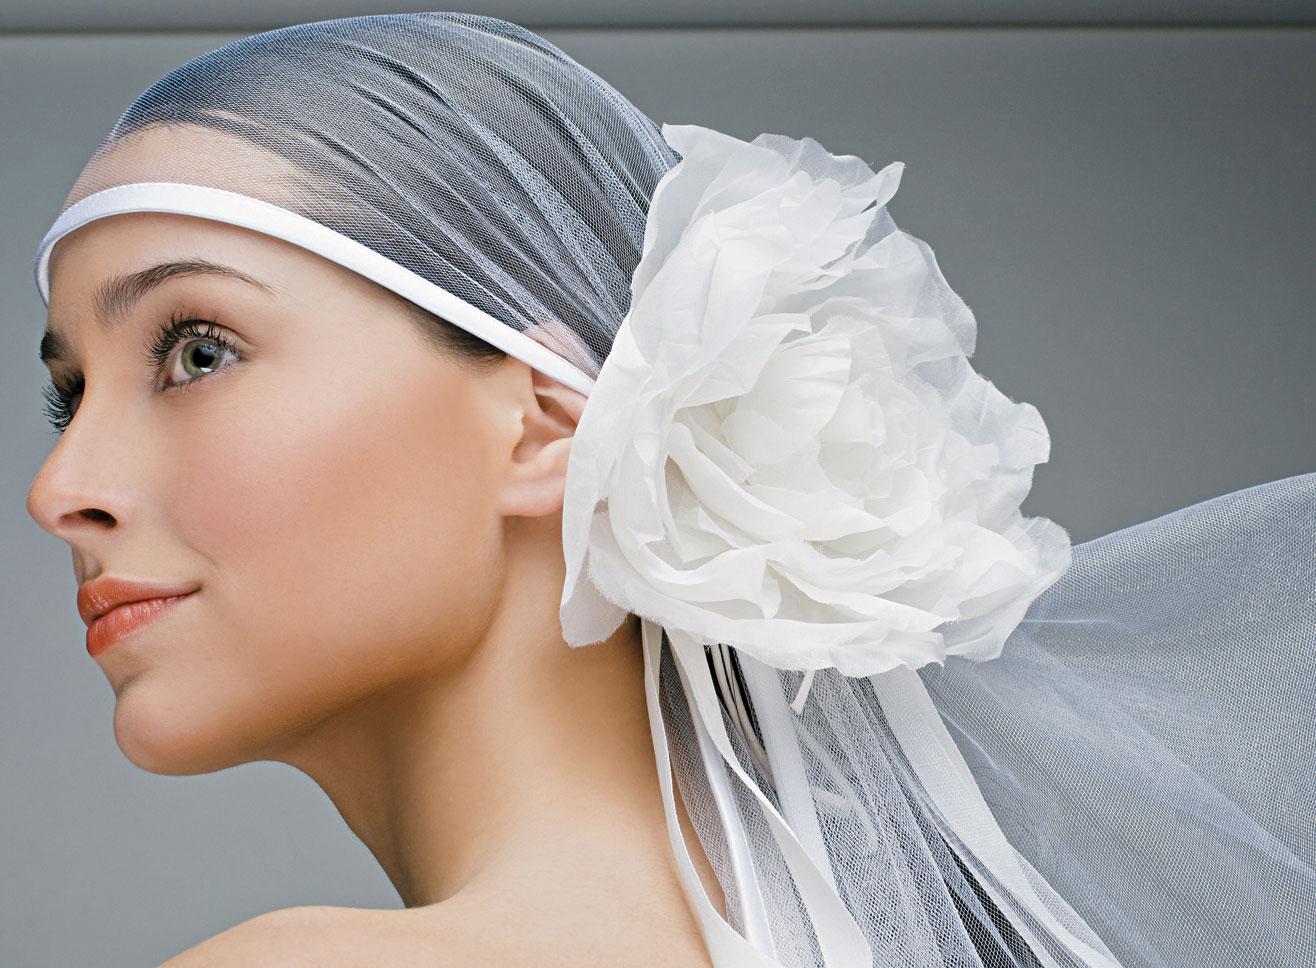 O Véu Perfeito Vai Deixá-la Linda no Casamento